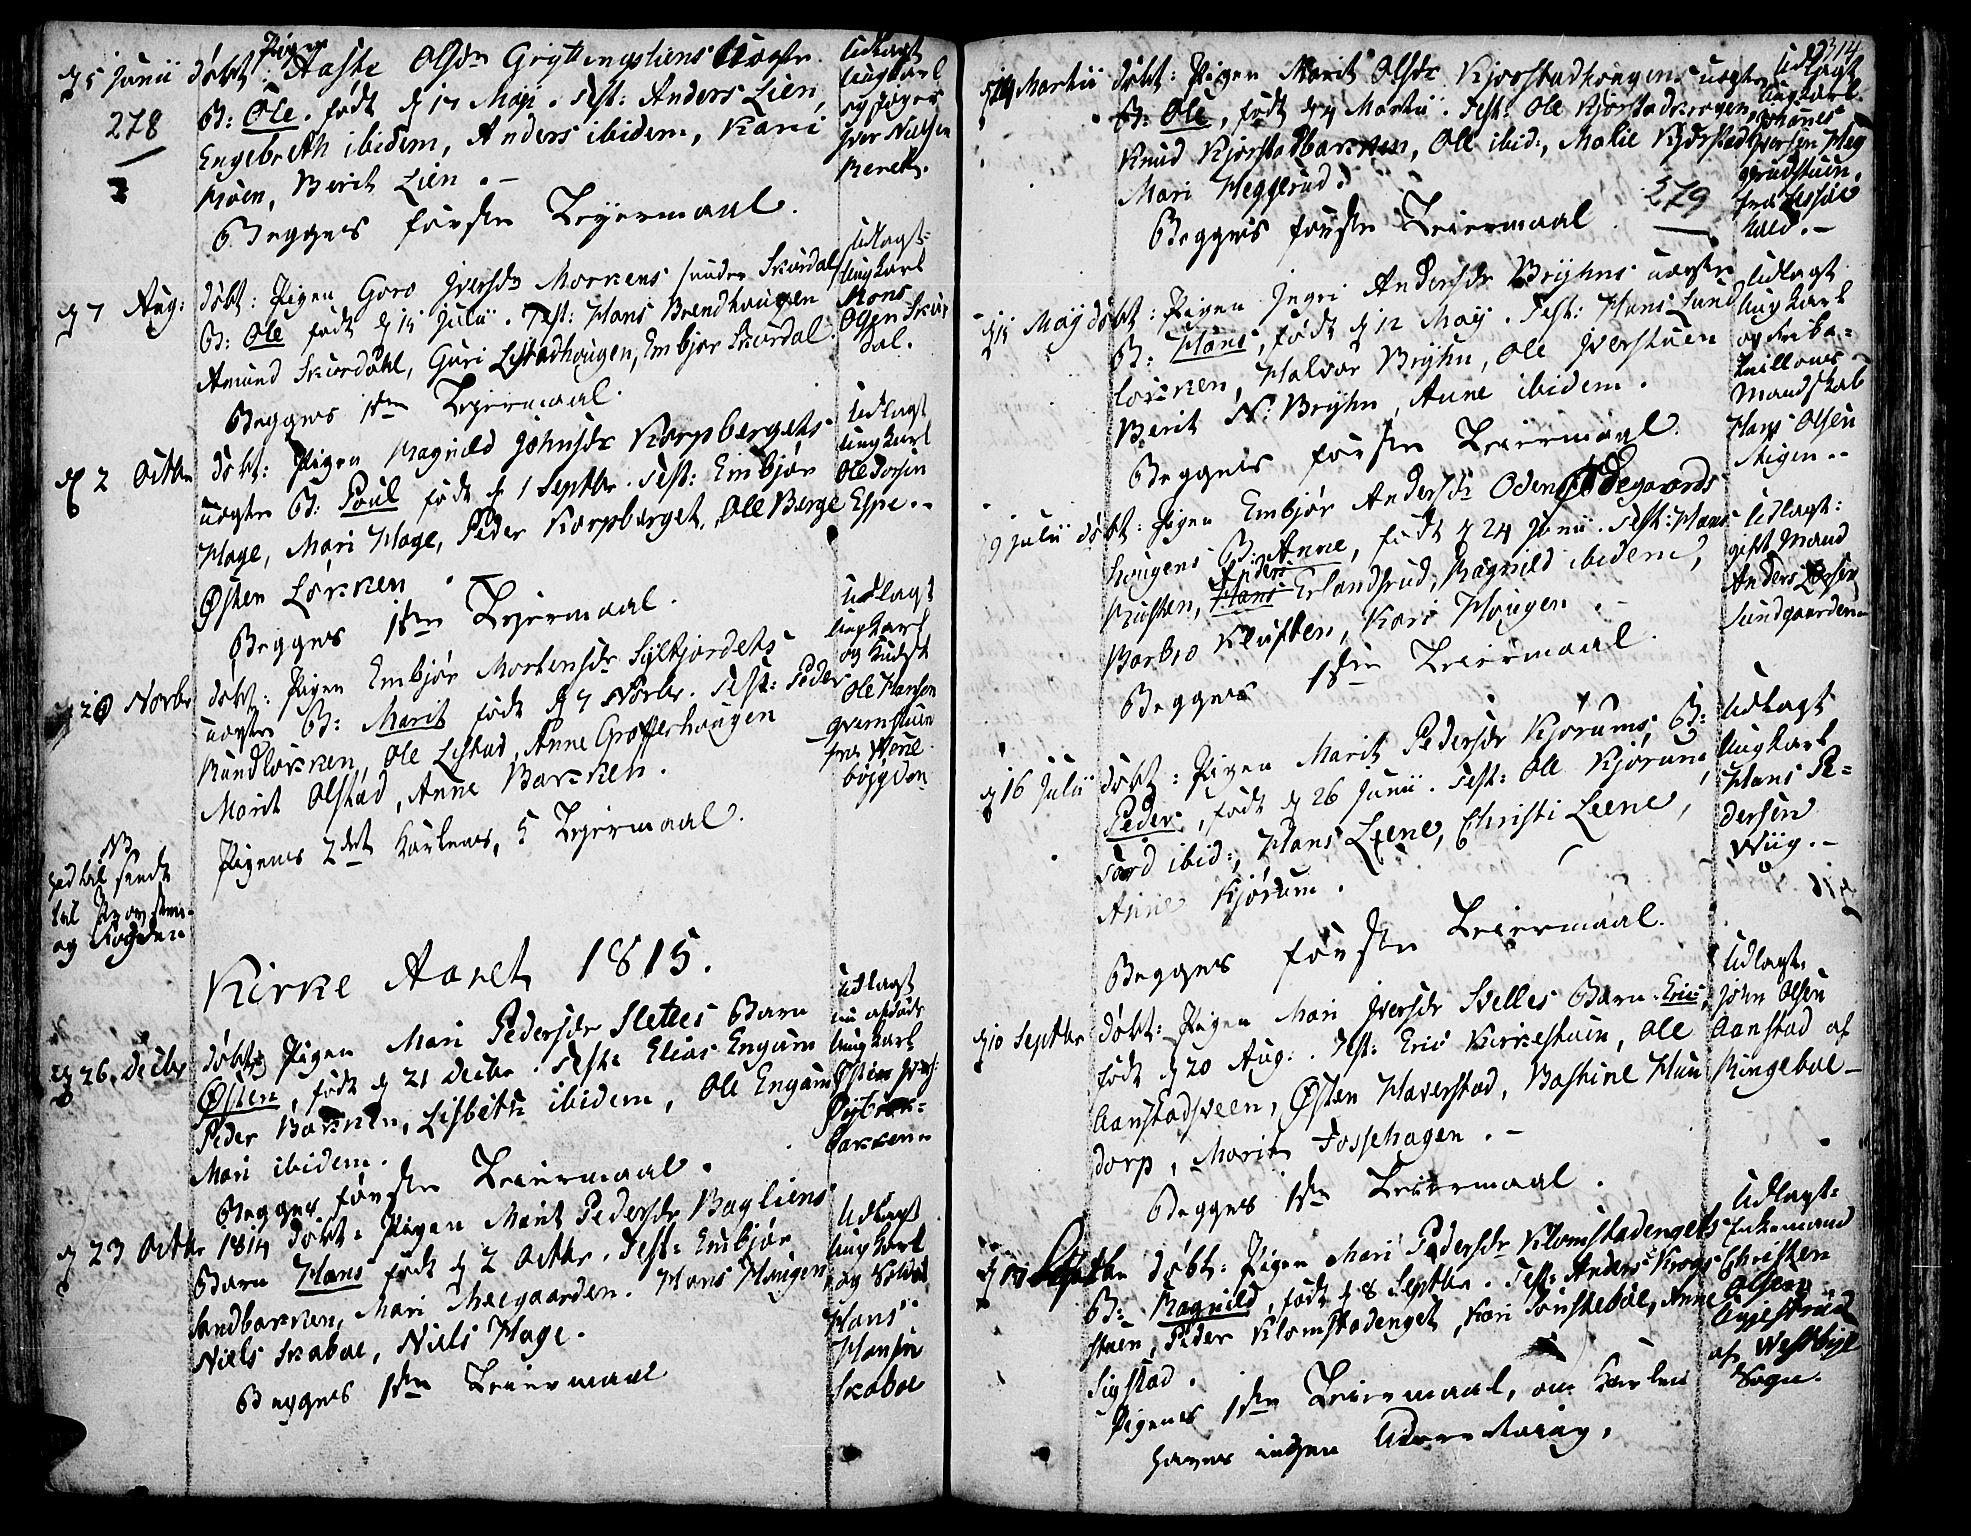 SAH, Fron prestekontor, H/Ha/Haa/L0001: Ministerialbok nr. 1, 1799-1816, s. 278-279